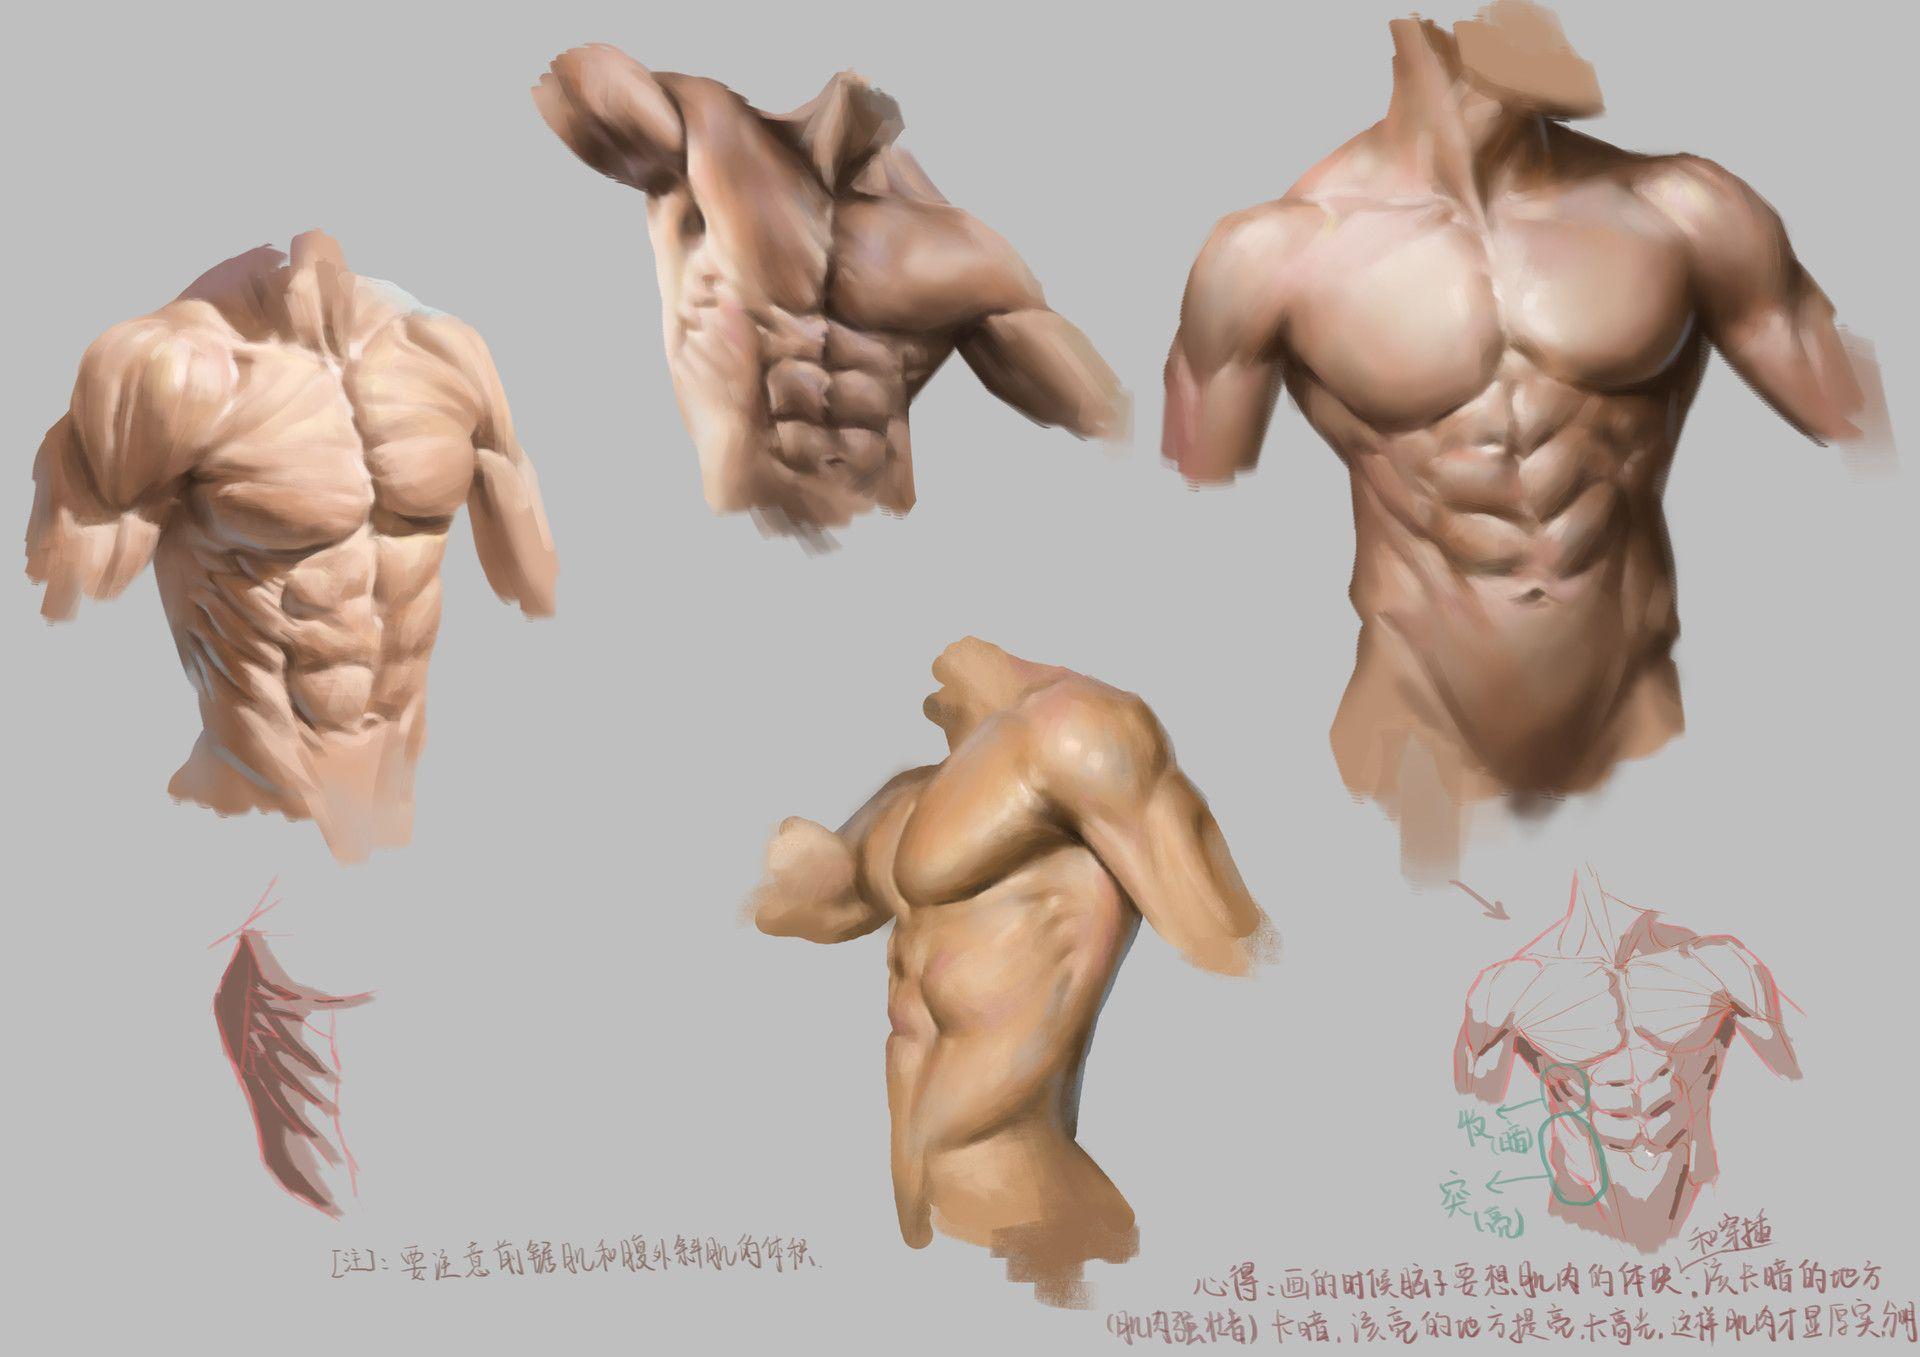 Male body study, Qiaofeng Chen